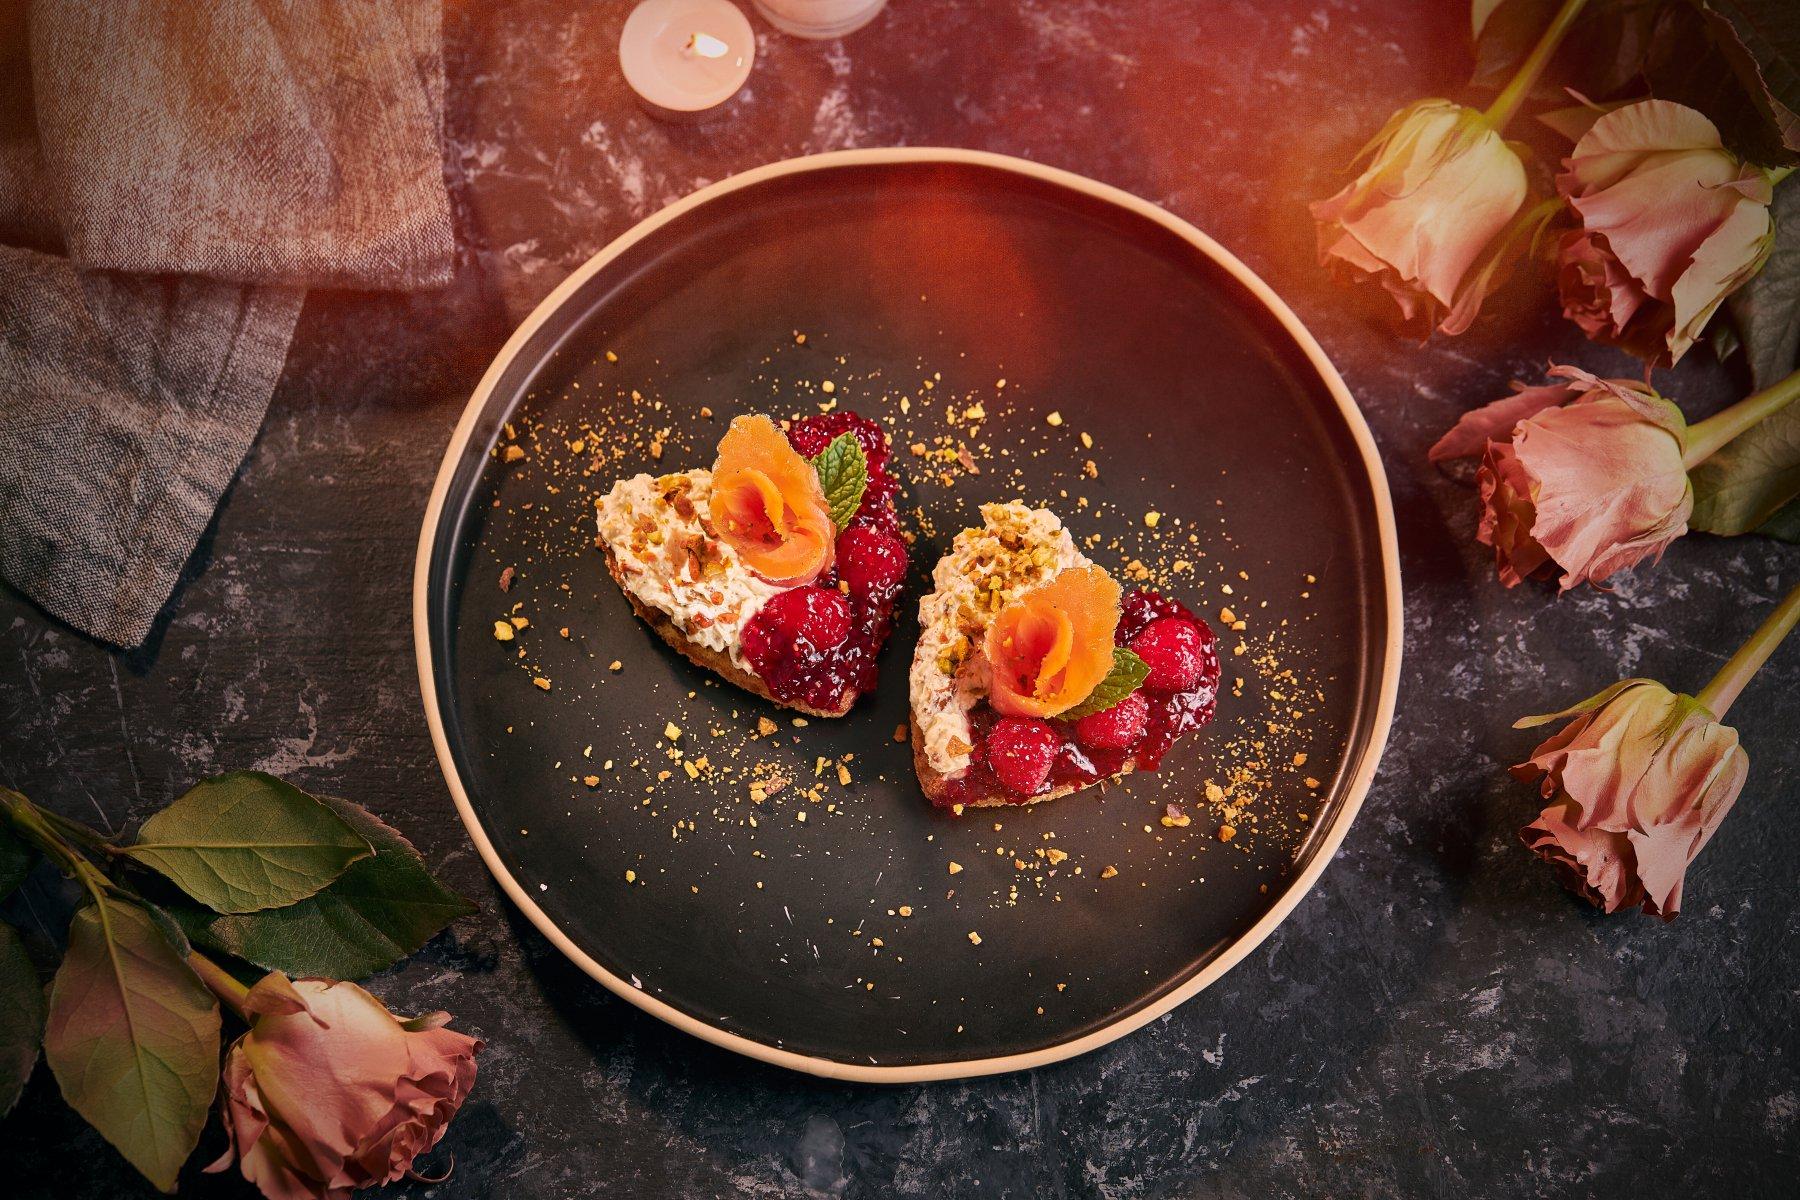 Heart-Shaped Valentine's Cold Smoked Pistachio Roti